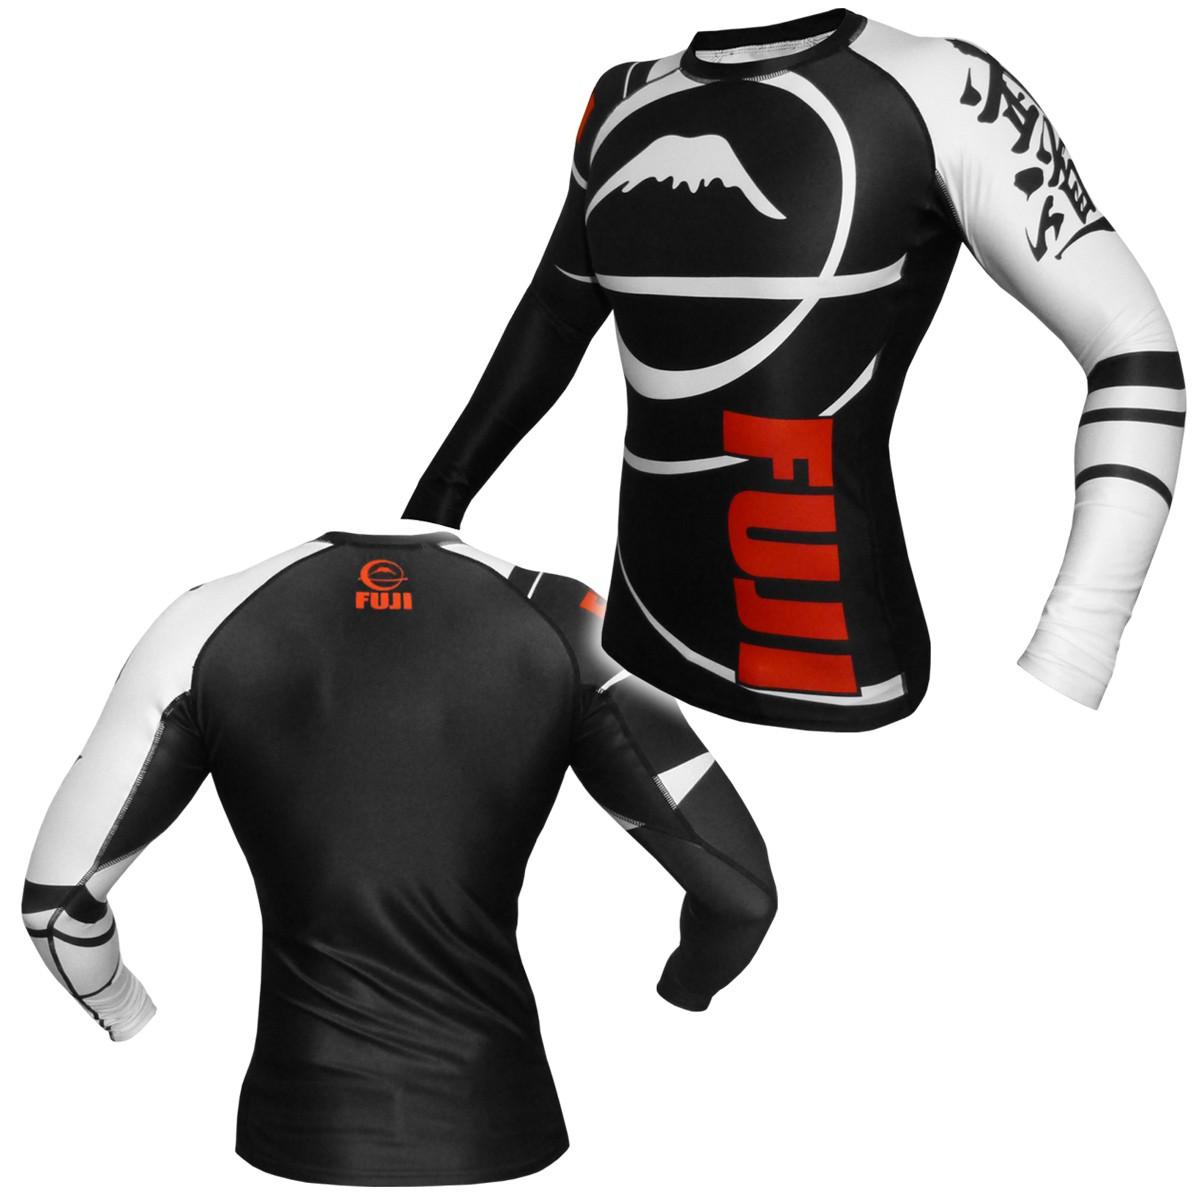 FUJI Sports Freestyle IBJJF Ranked Rashguard Black Long Sleeve